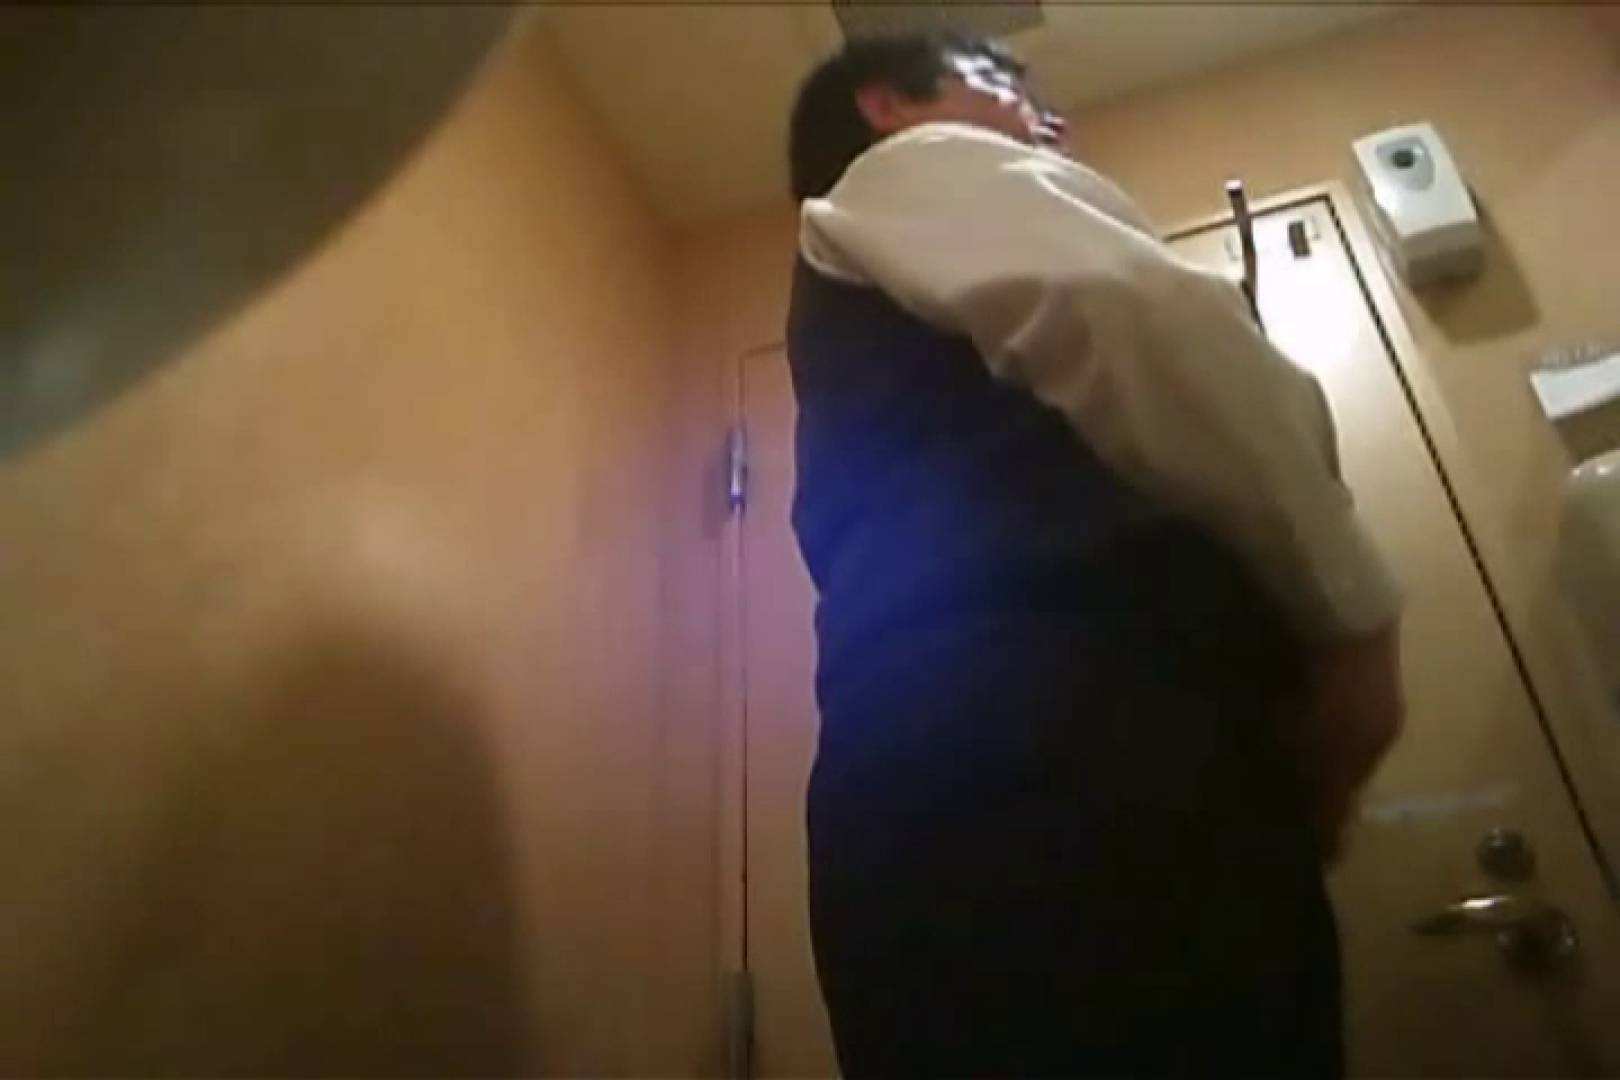 SEASON 2ND!掴み取りさんの洗面所覗き!in新幹線!VOL.05 私服 ゲイアダルト画像 80連発 15